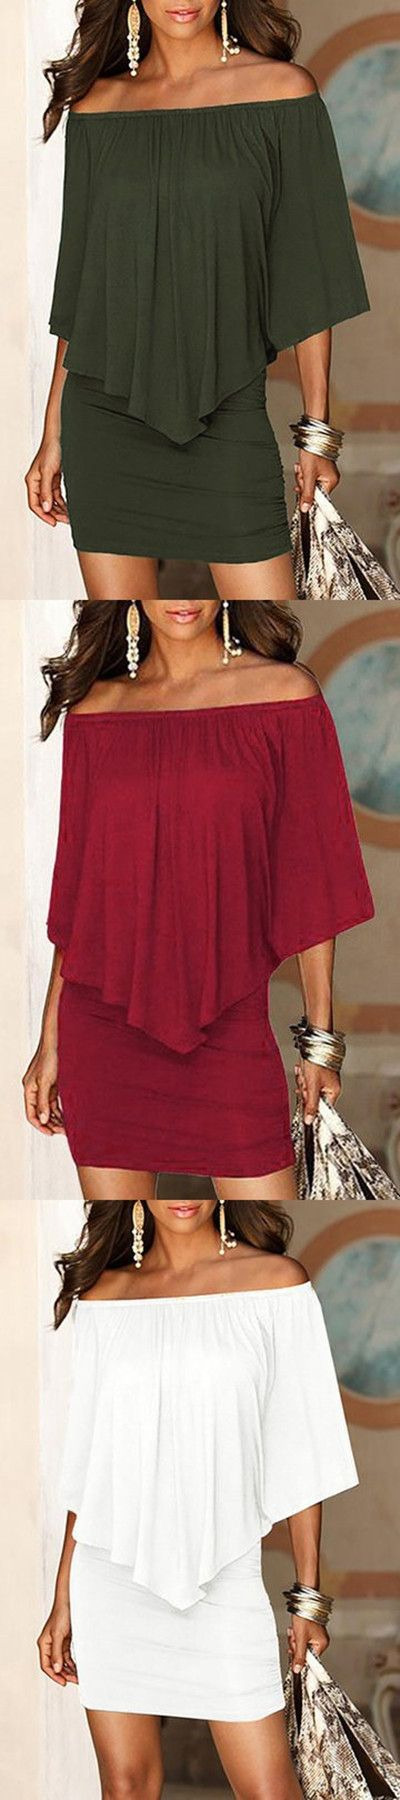 Off The Shoulder Ruffles Overlay Design Mini Dress